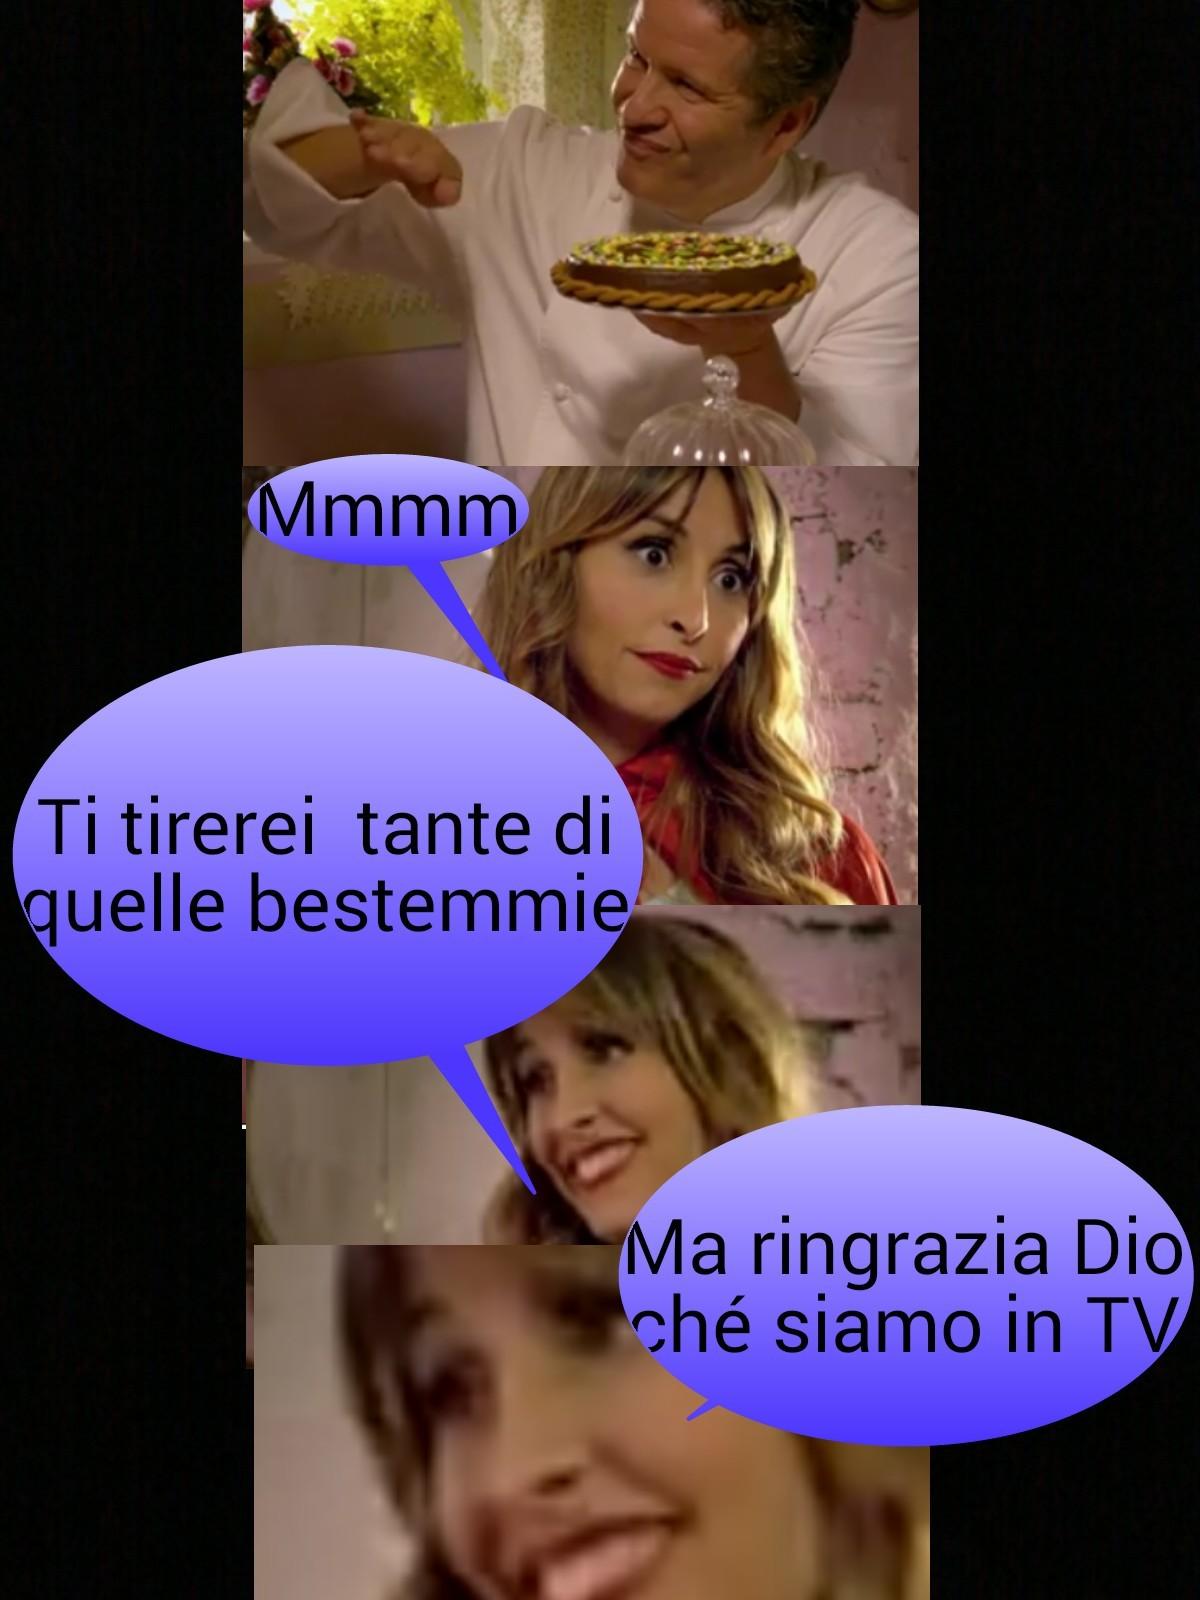 Mlmlmlml23 - meme